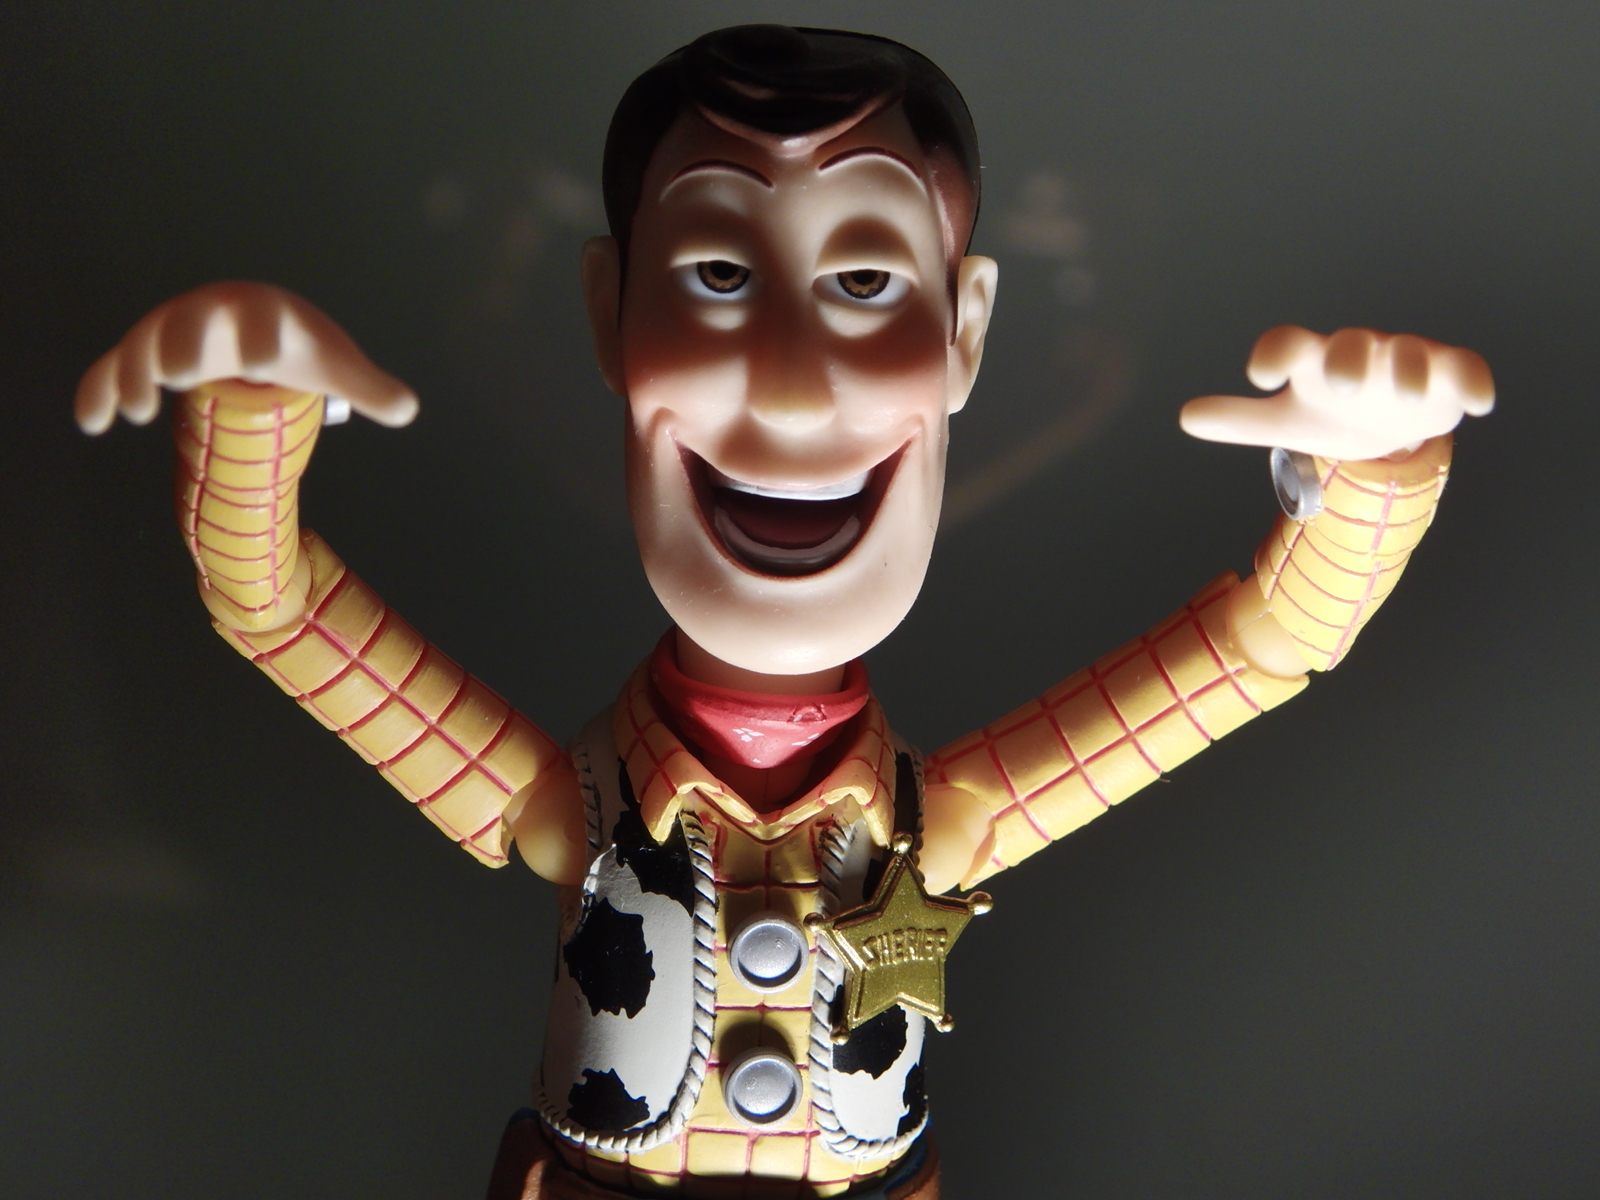 revoltech pixar kaiyodo woody toy_story matsumoto_eiichiro revoltech_sfx